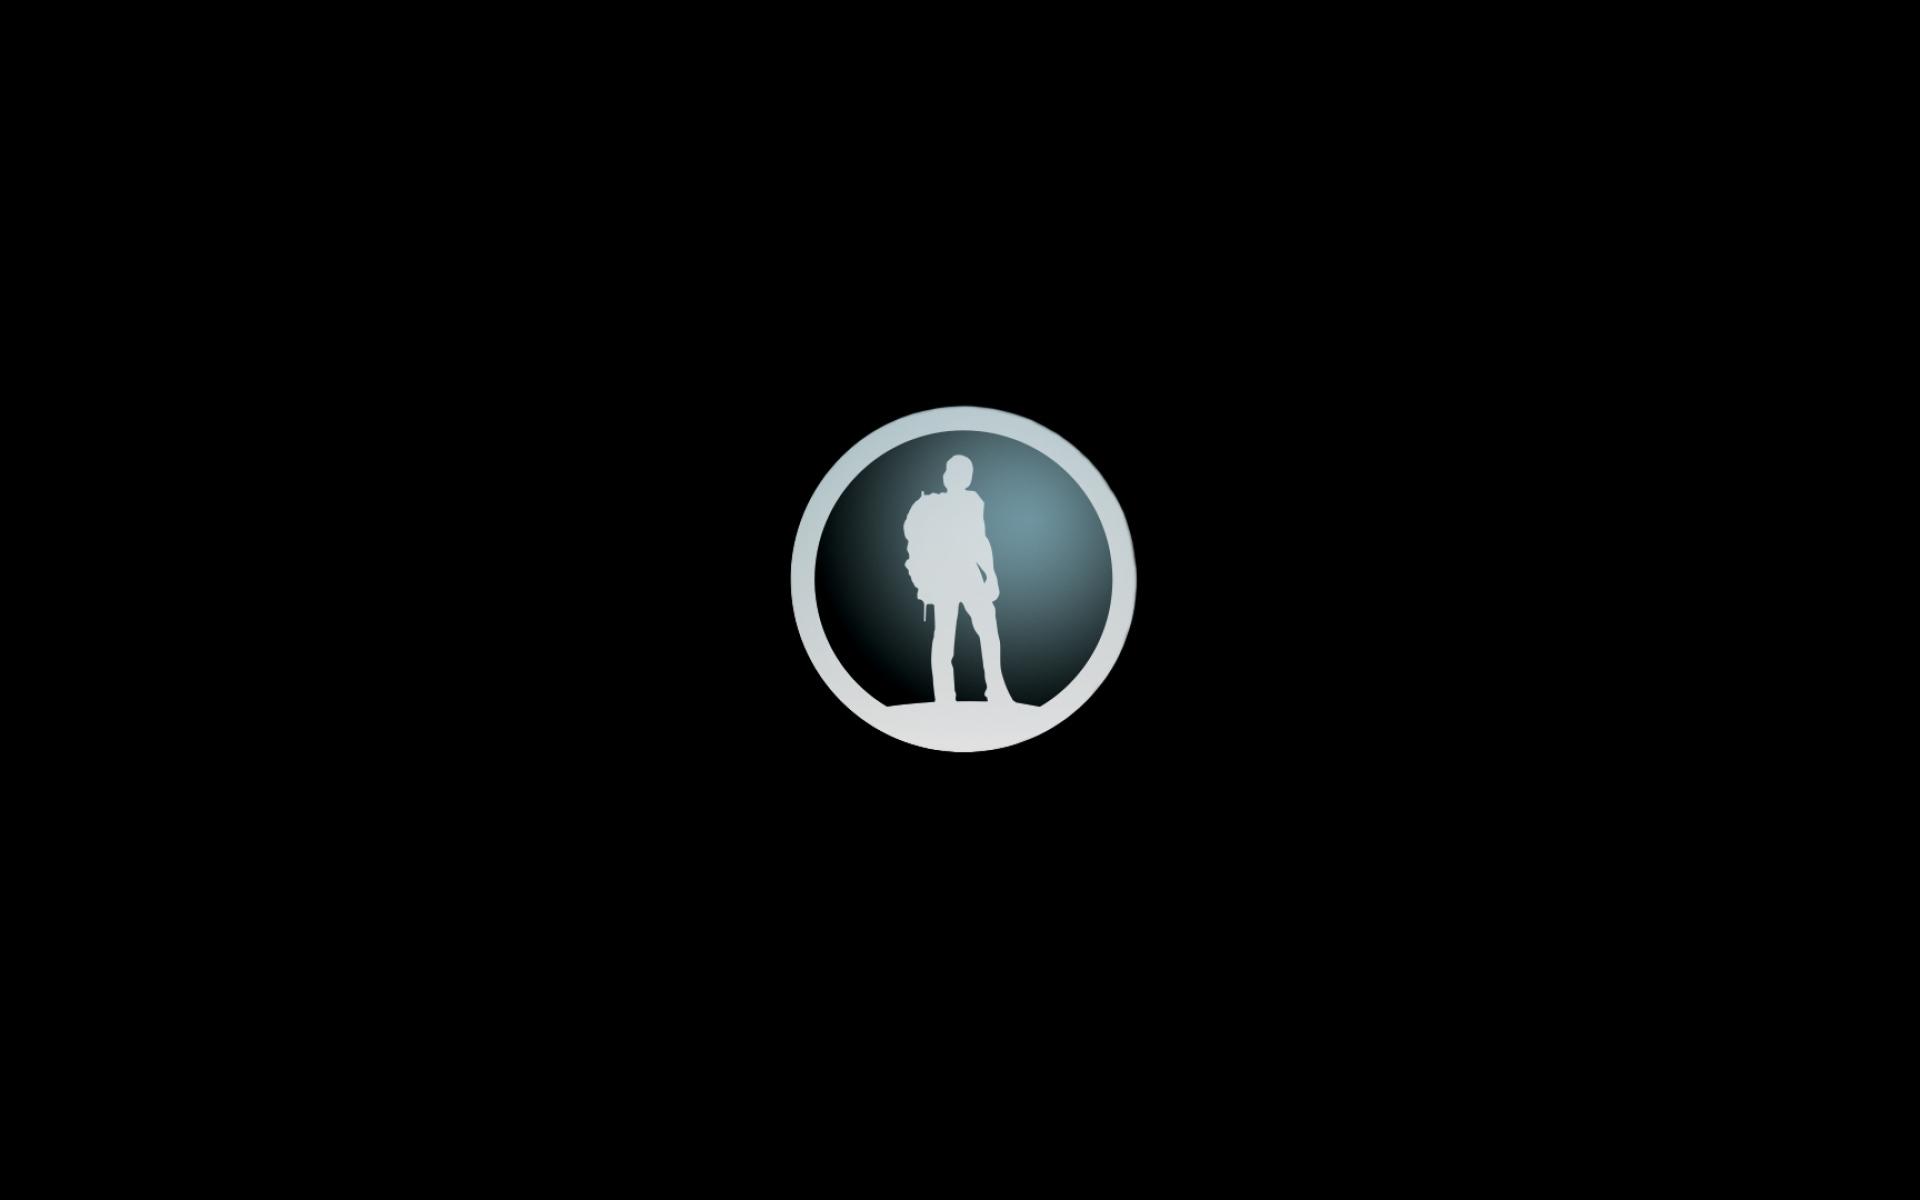 Картинки Моя планета, путешествия, логотип, канал фото и обои на рабочий стол